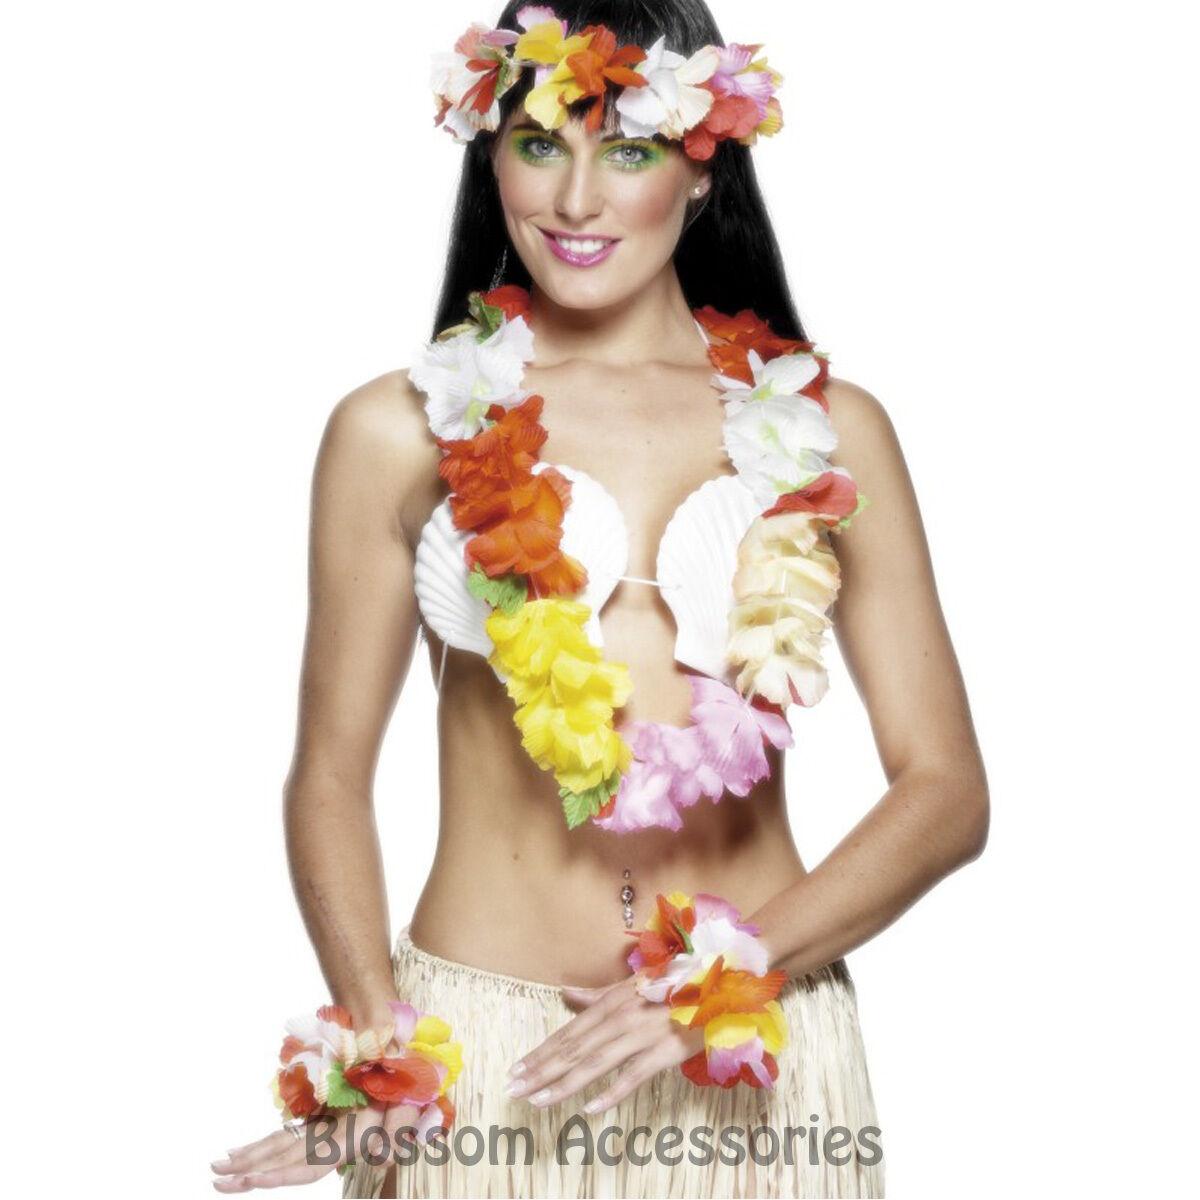 A483 Hawaiian Luau Beach Tropical Costume Accessory Garland Headpiece Wrist Cuff